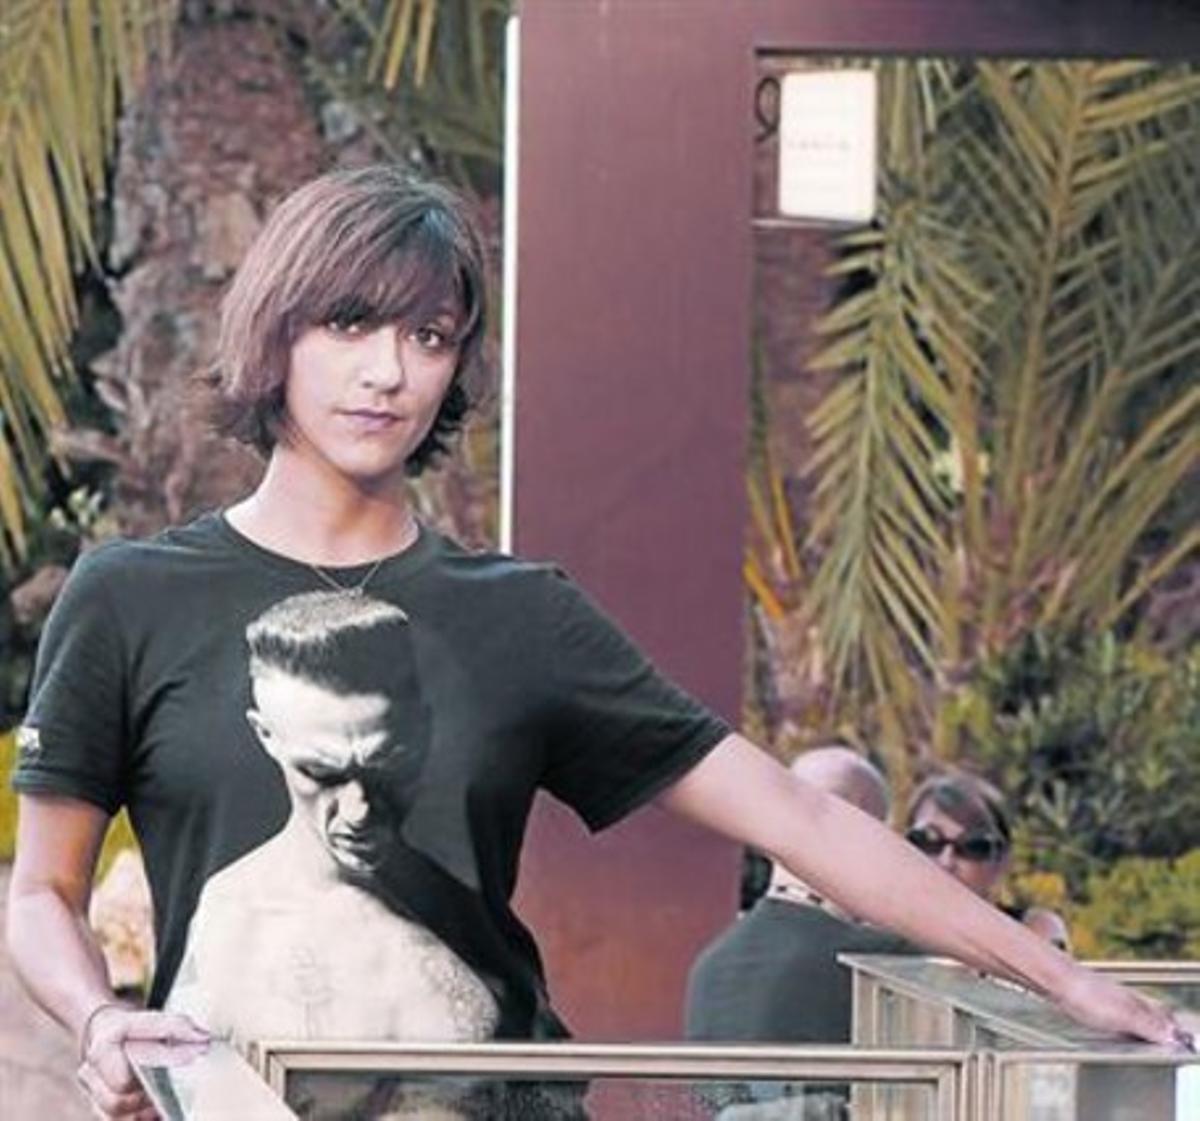 La directora de origeniraní Ana Lily Amirpour,ayer en Sitges.